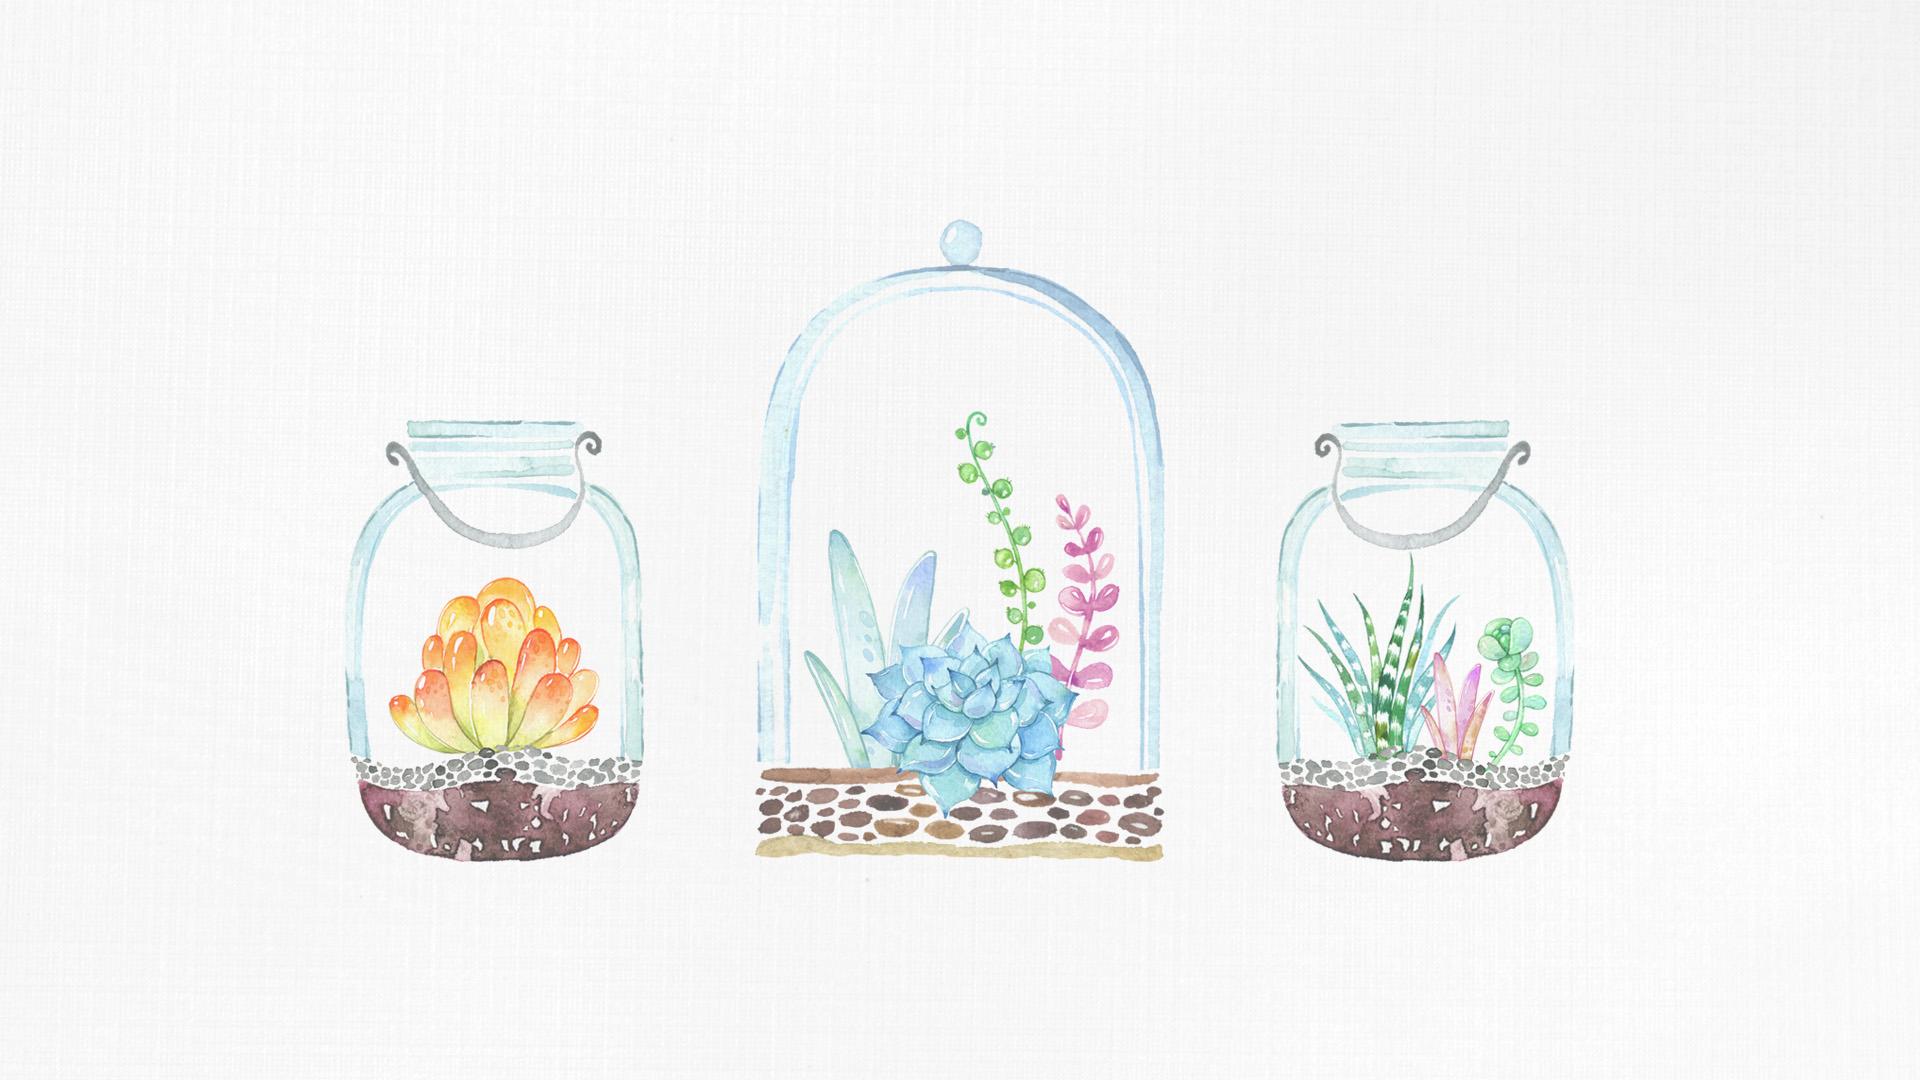 Cute Cactus Wallpaper Macbook Free Desktop Wallpaper Mason Jar Succulents The